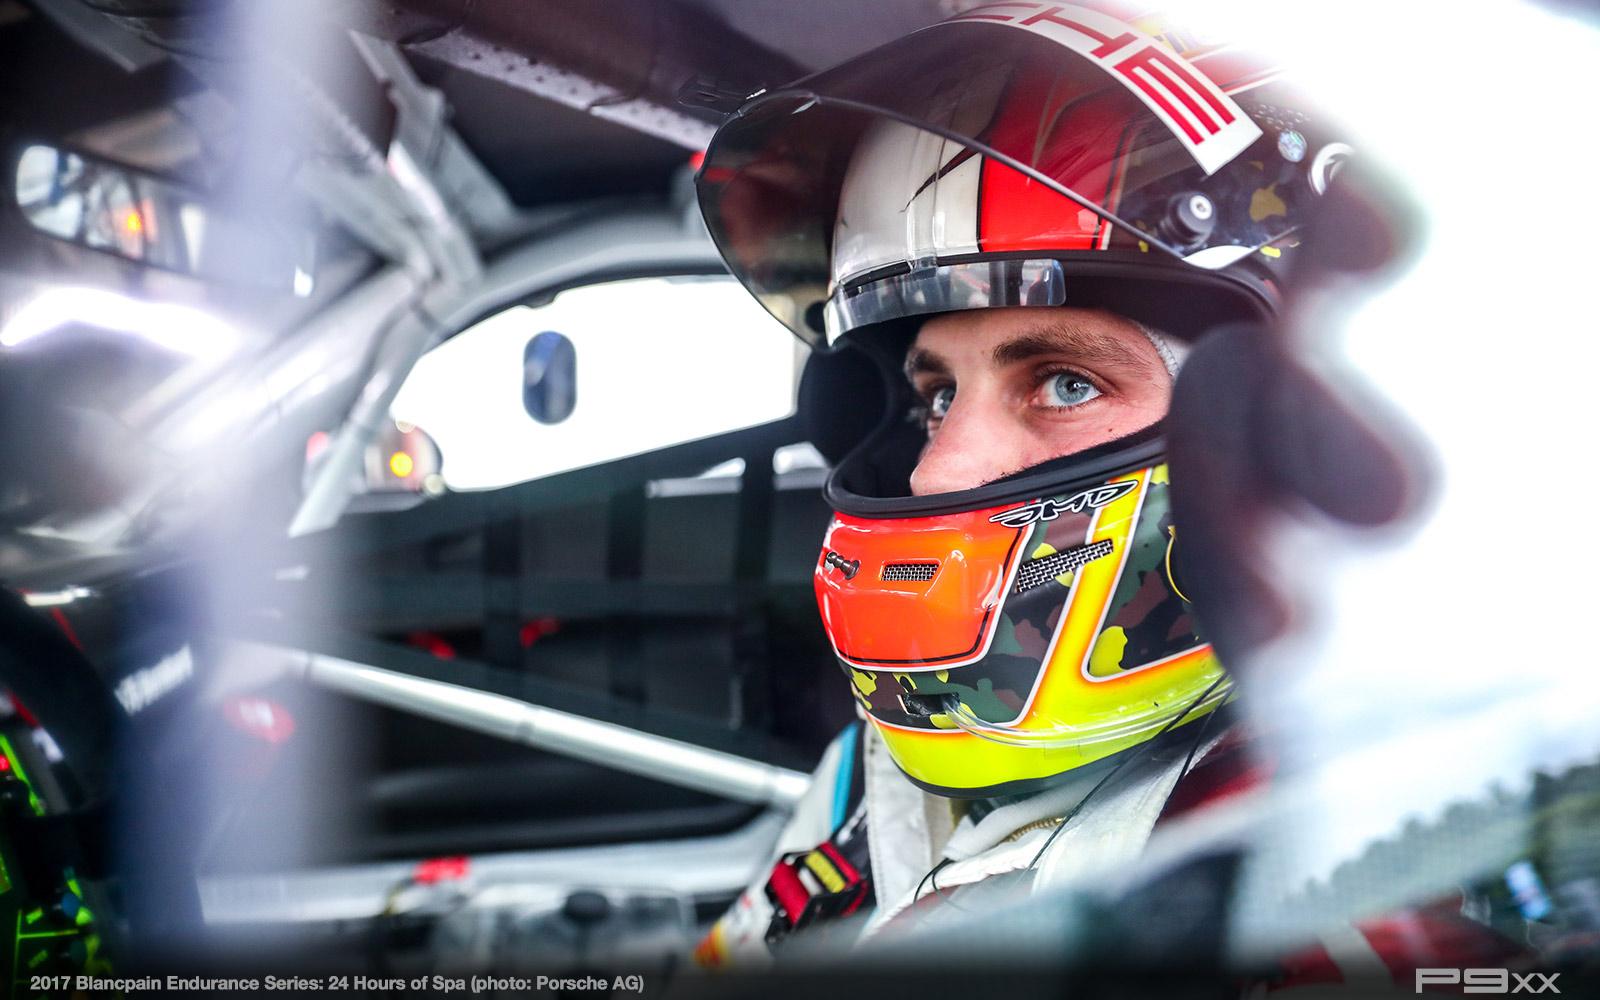 2017-24-Hours-of-Spa-Porsche-336